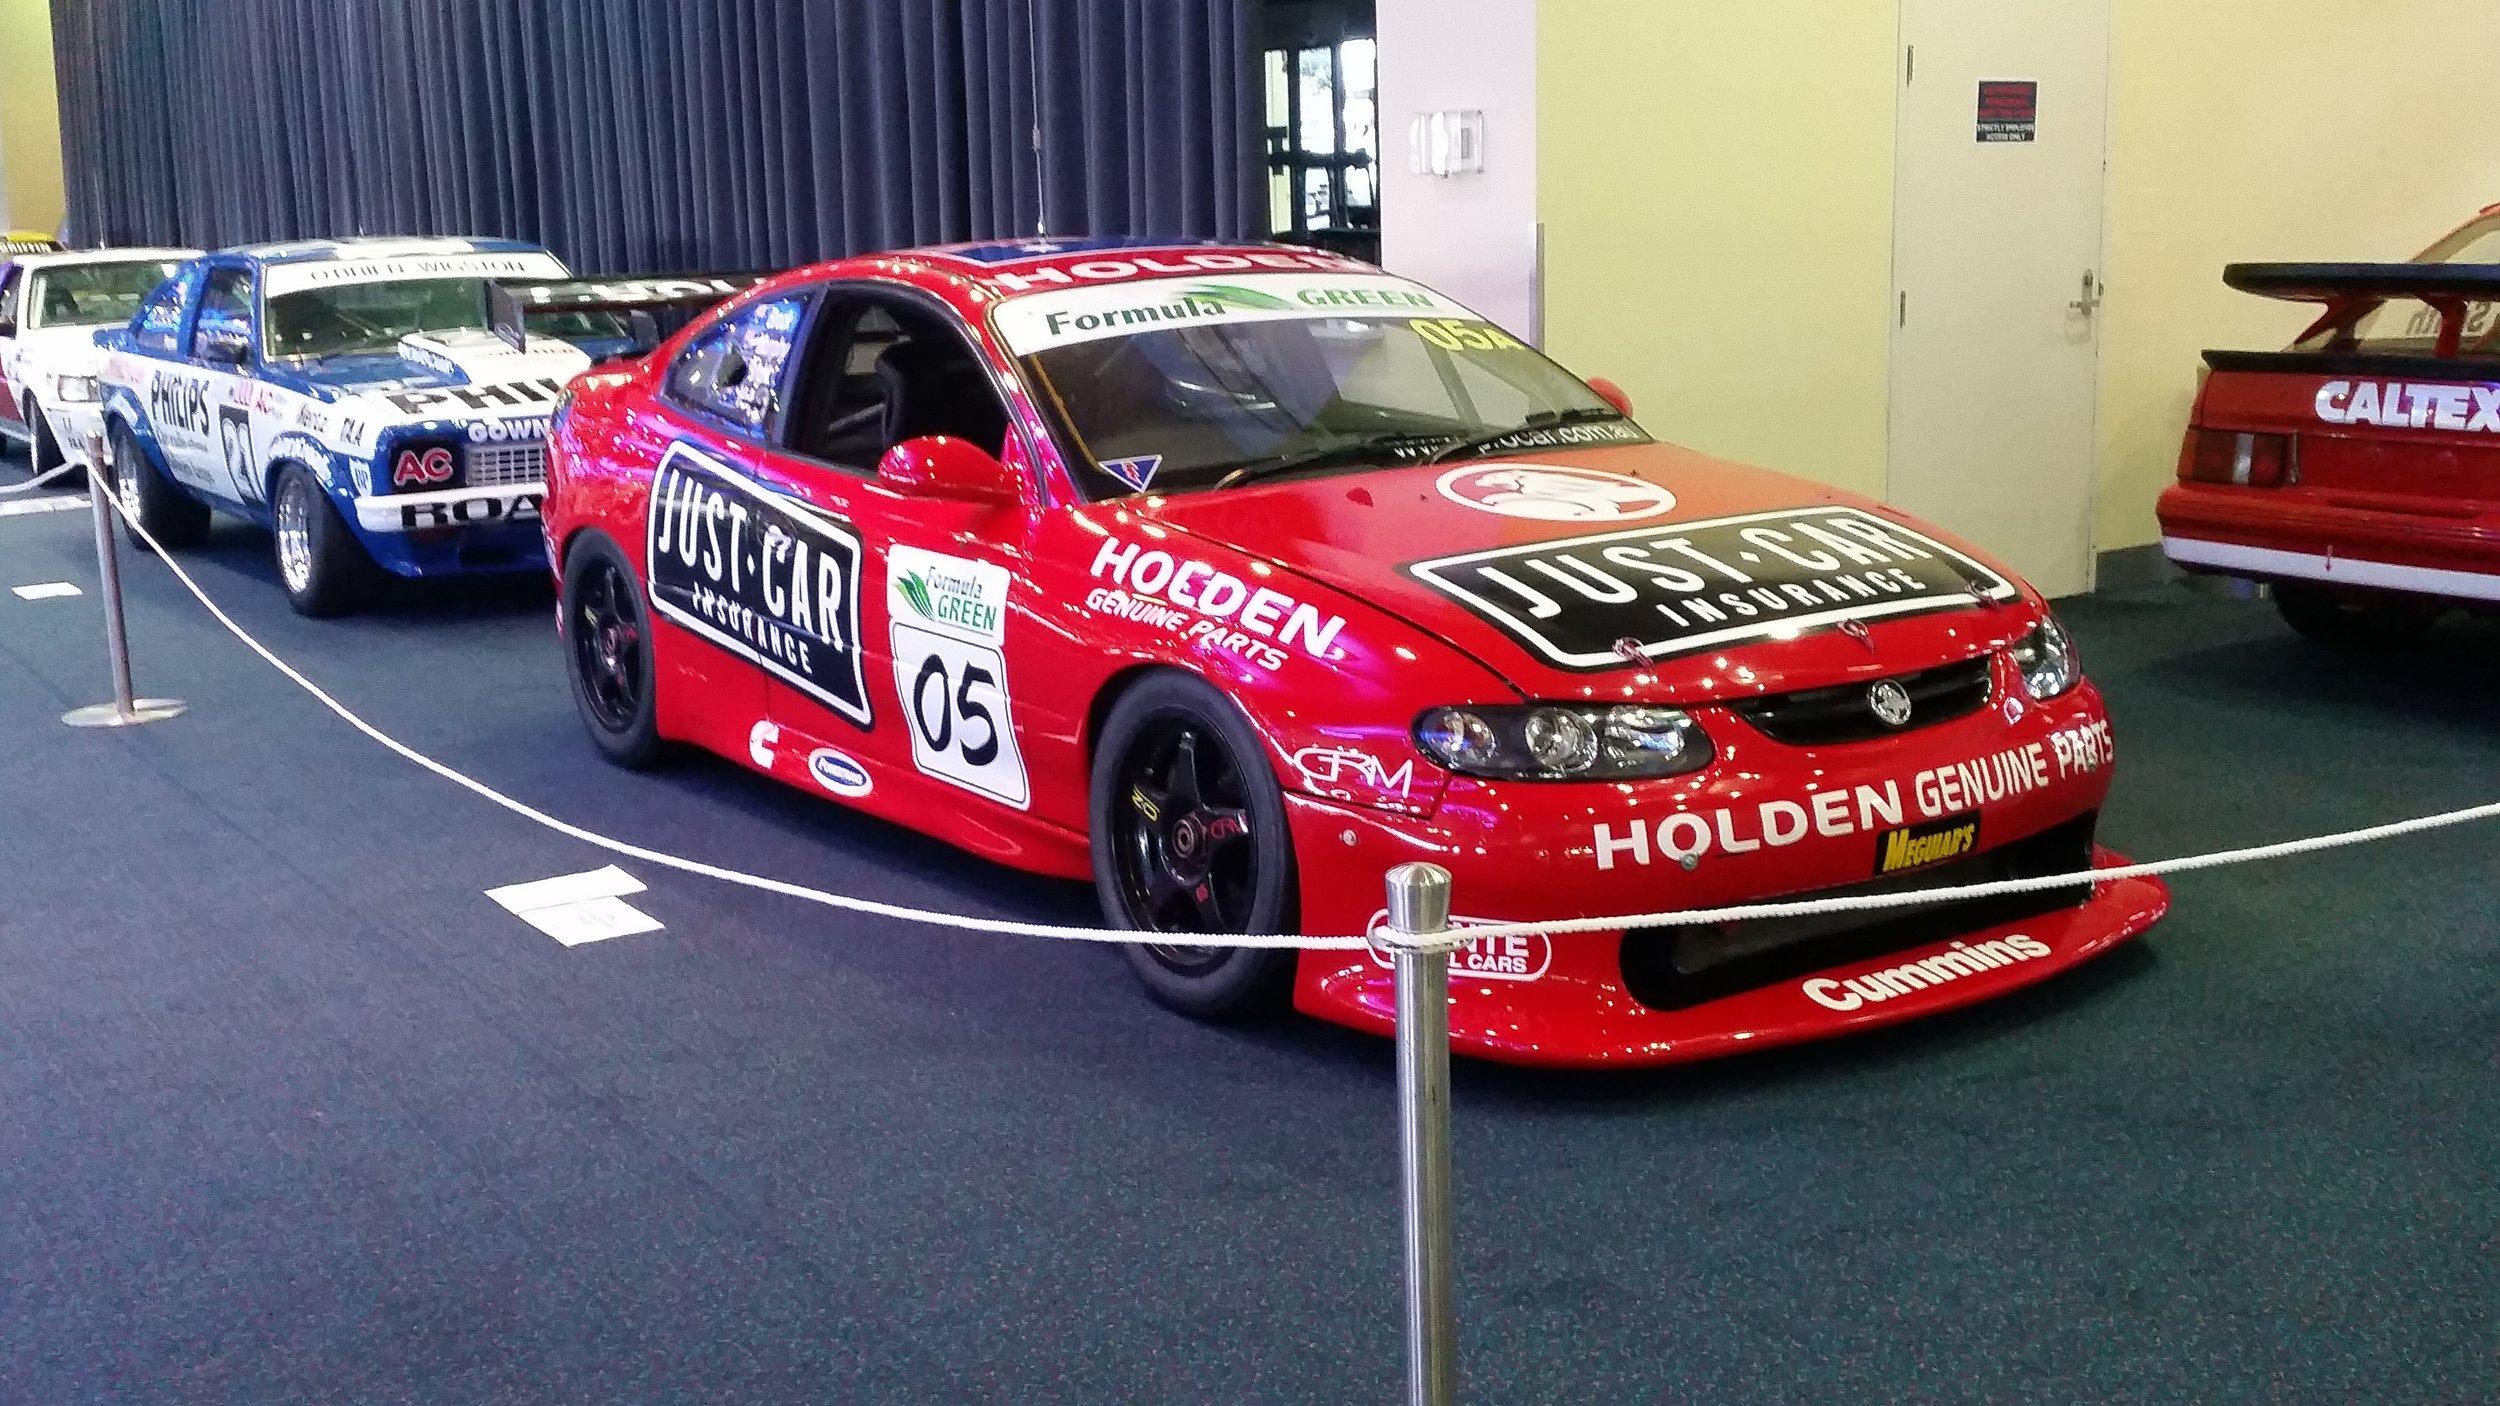 The Holden Monaro 427C that won the 2004 Bathurst 24 Hour